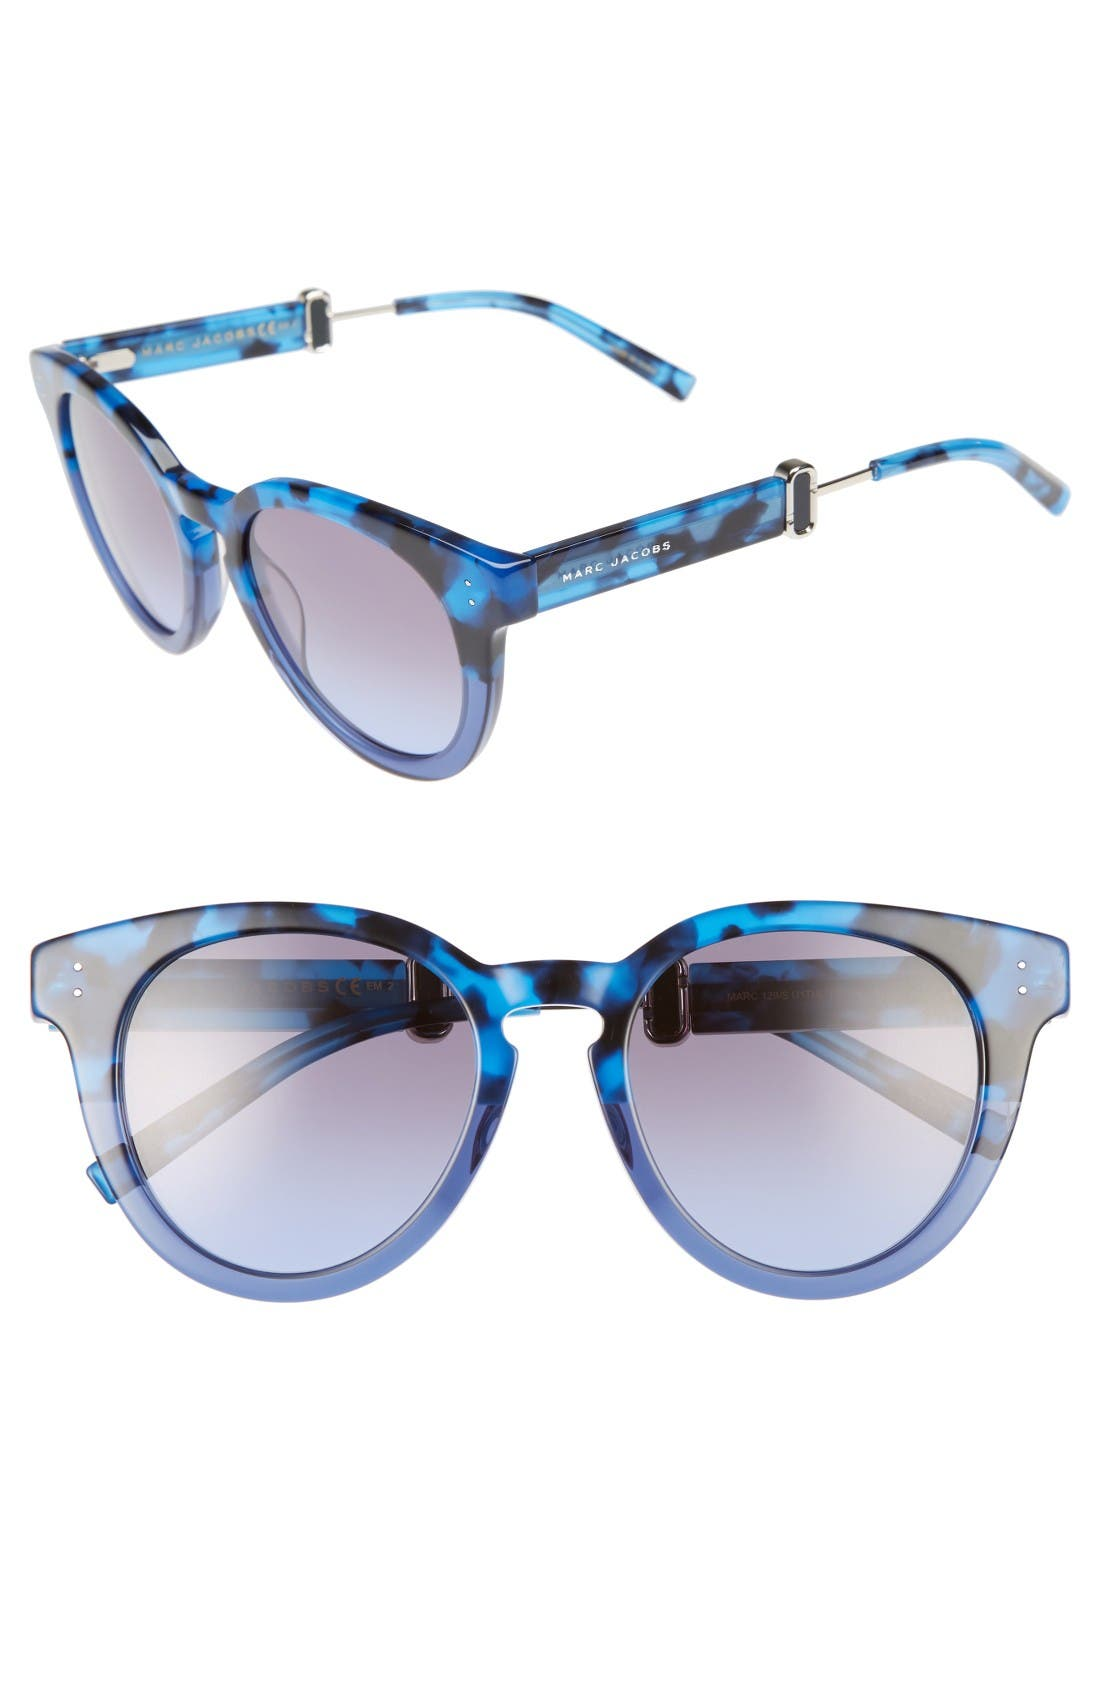 50mm Round Sunglasses,                             Main thumbnail 1, color,                             Blue Havana